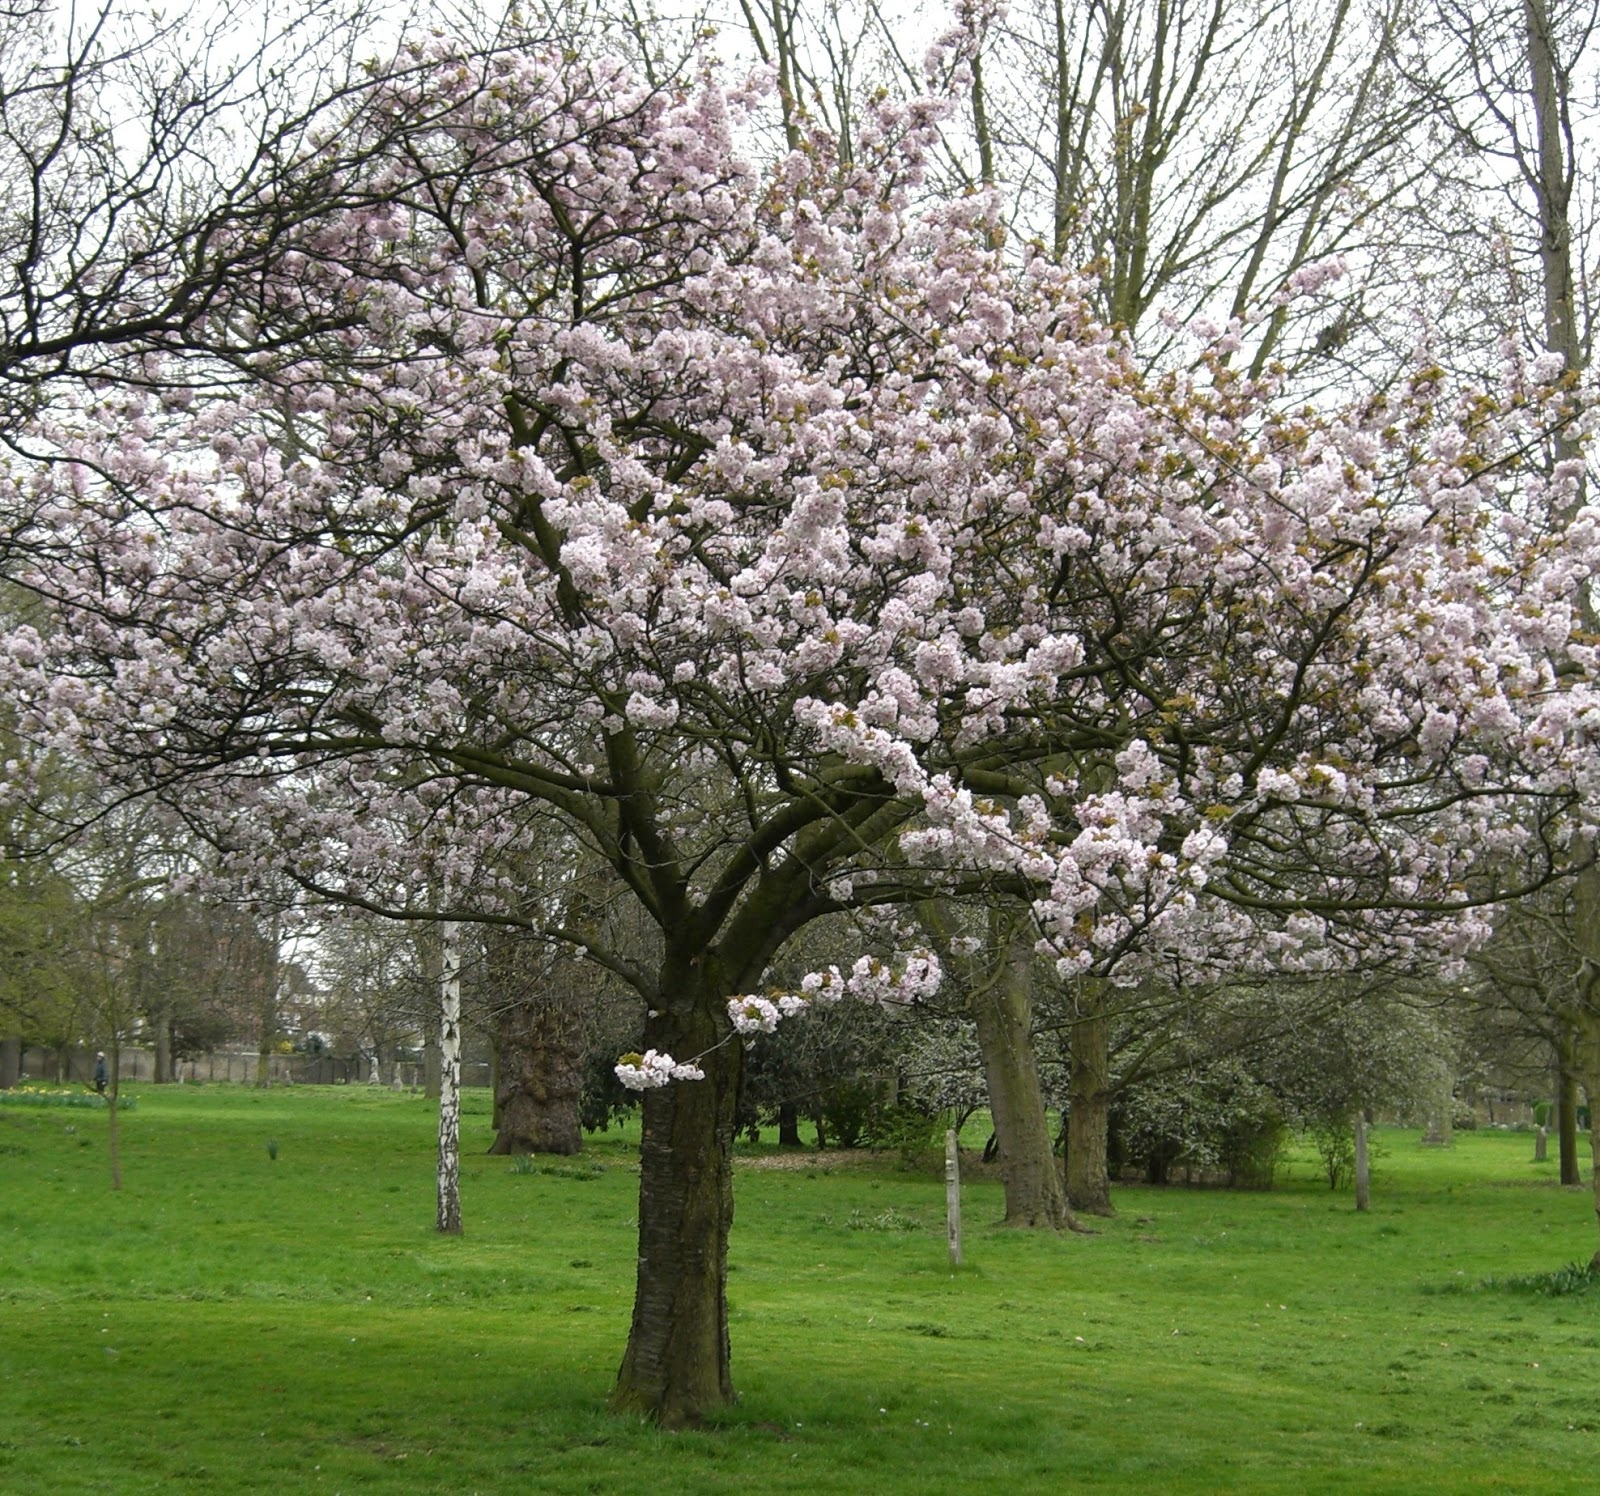 autumn graphics picture autumn flowering cherry tree. Black Bedroom Furniture Sets. Home Design Ideas